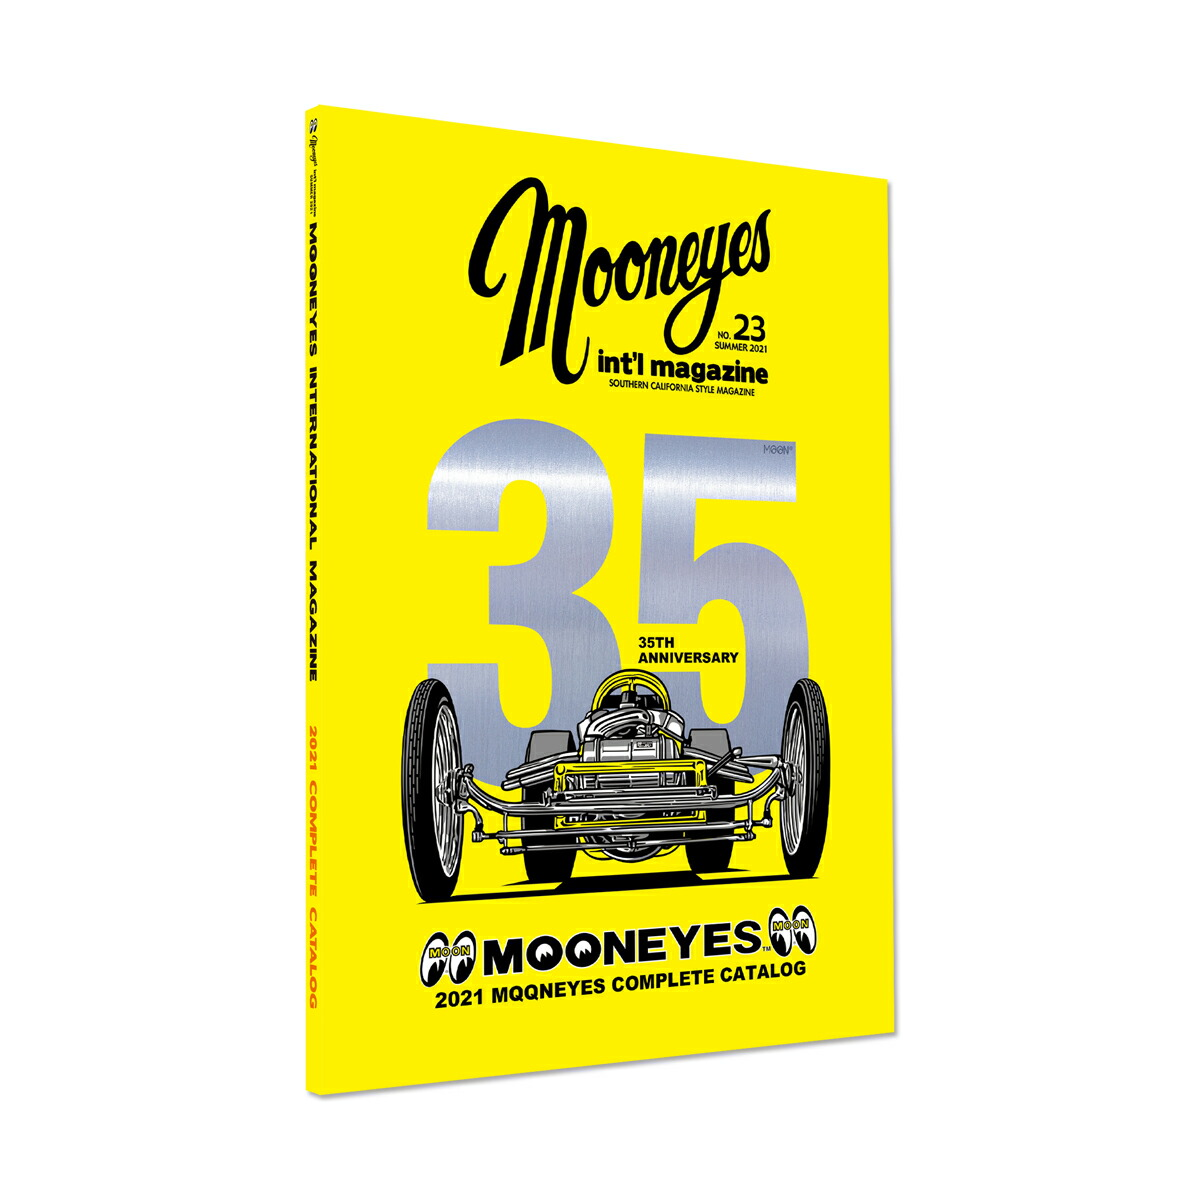 MOON Int'l Magazine Summer 2020